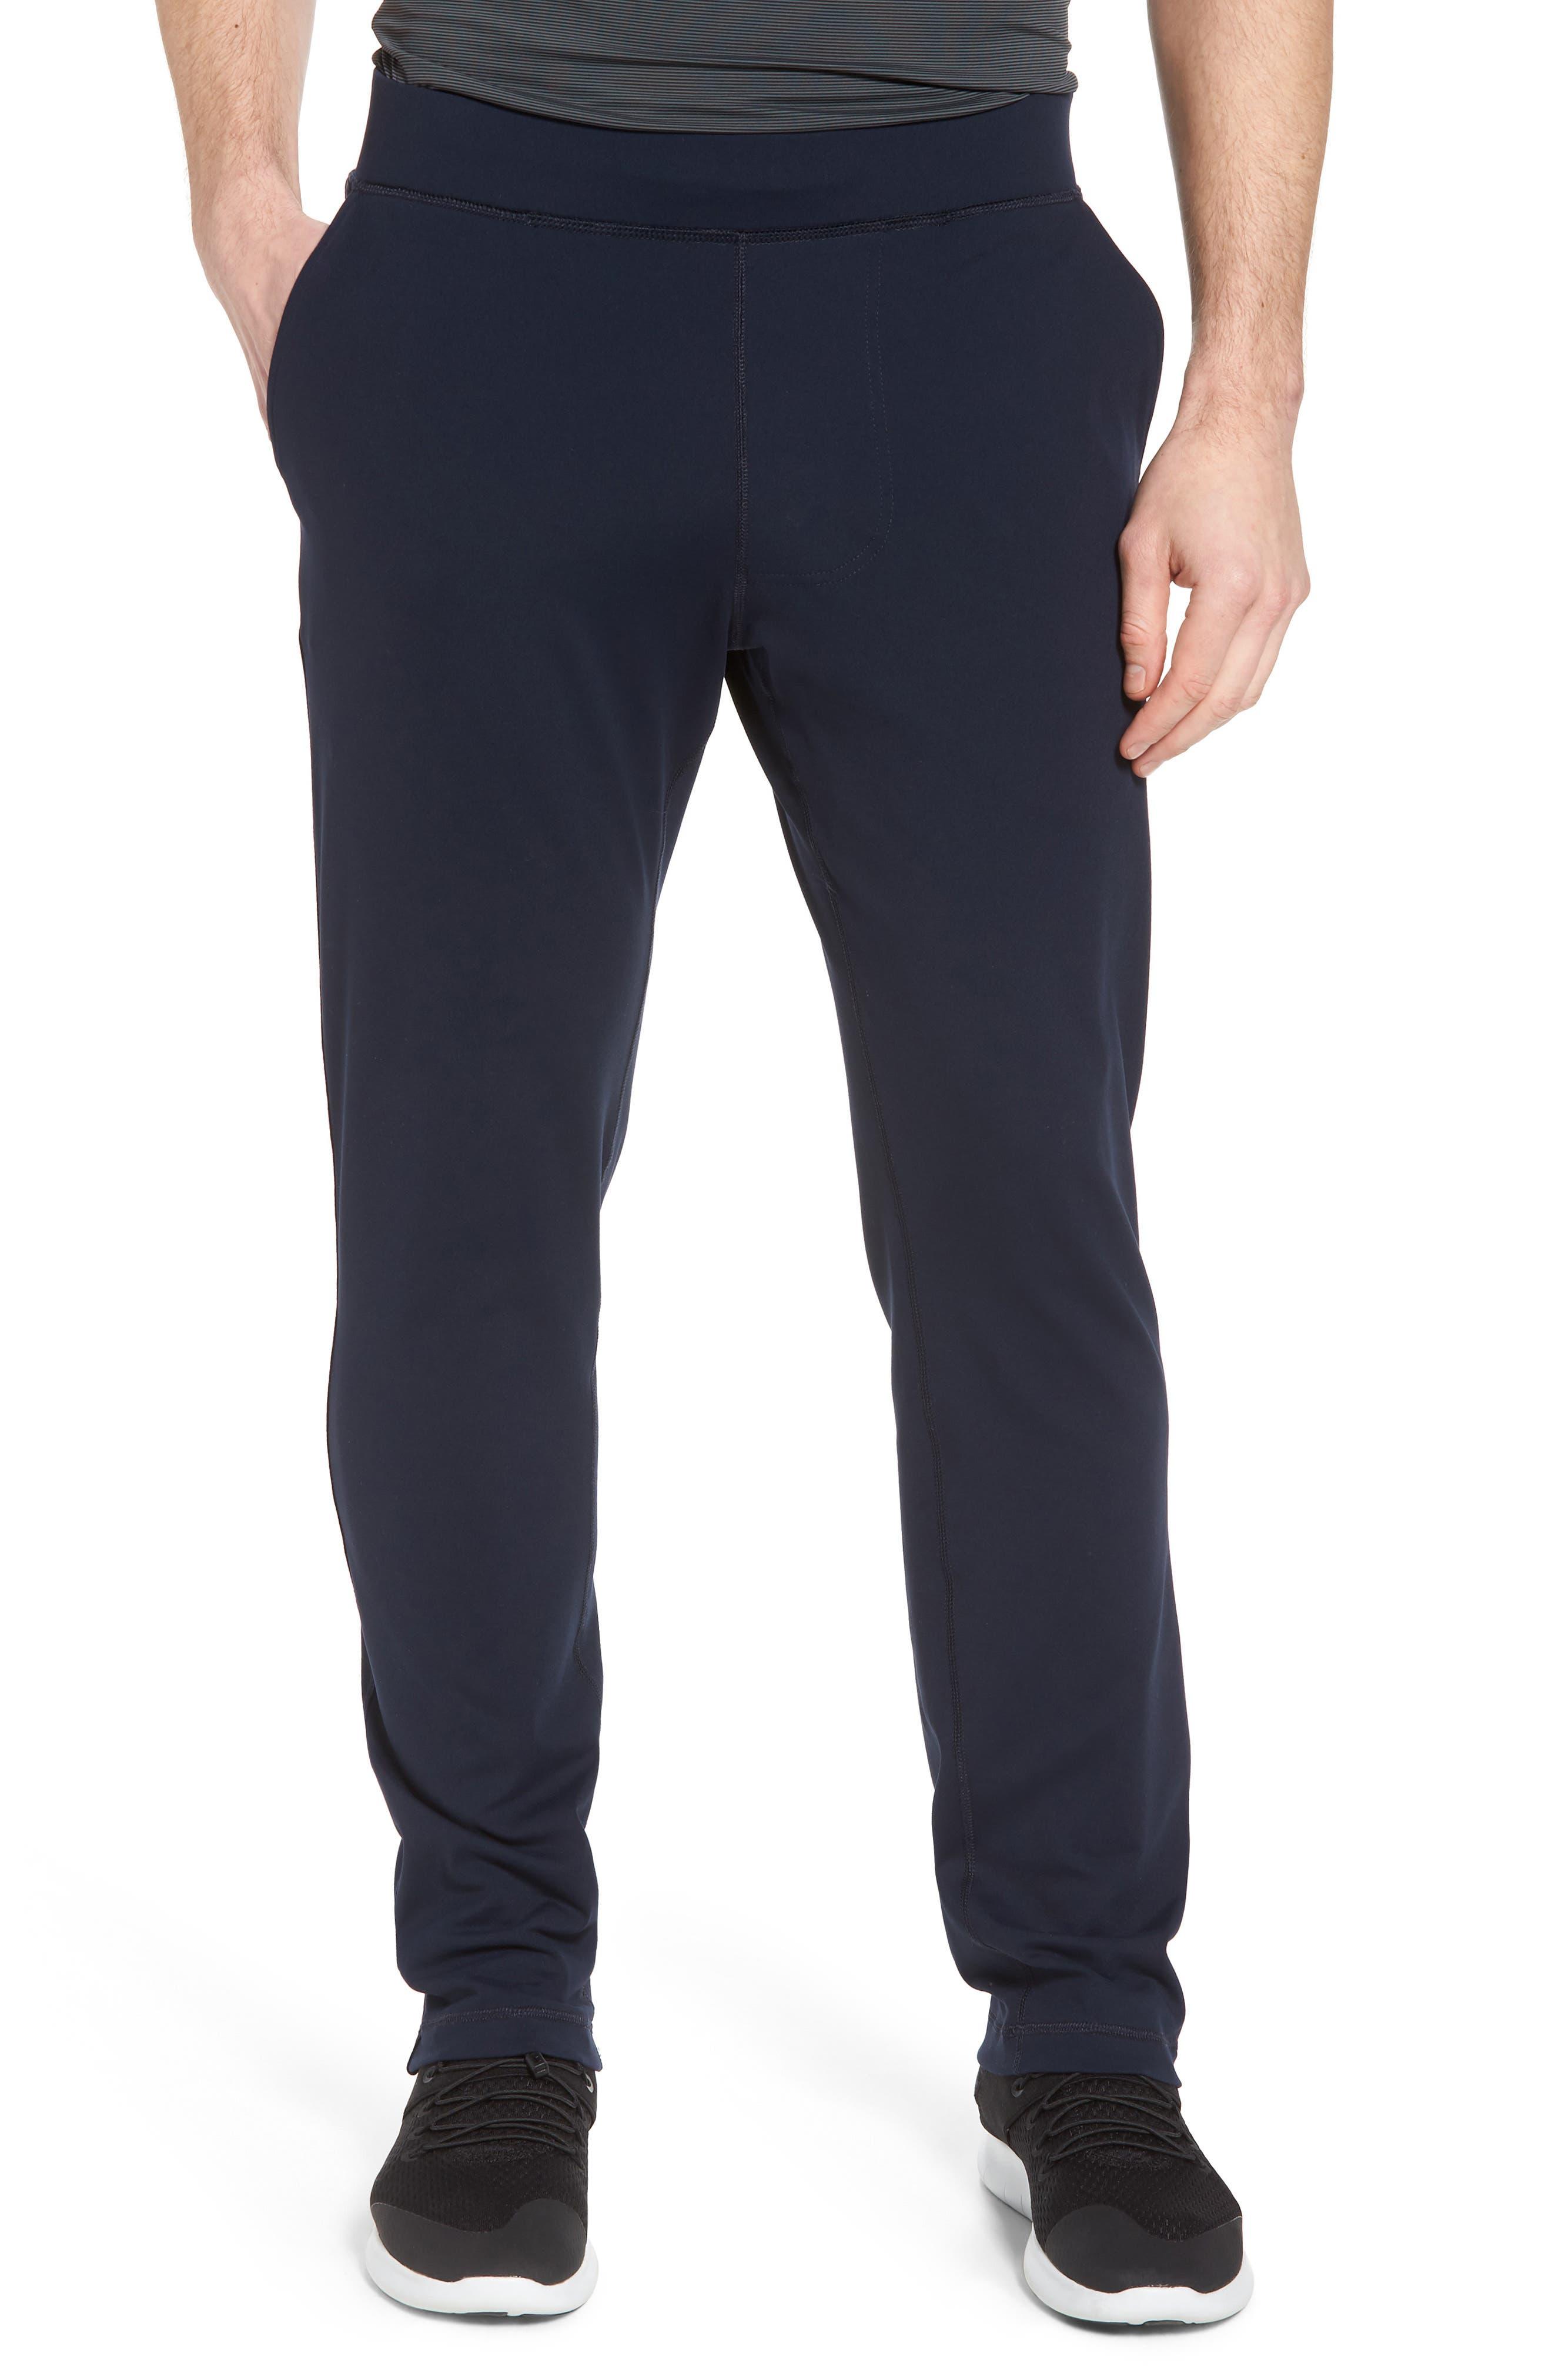 Sodo 206 Pants, Metallic